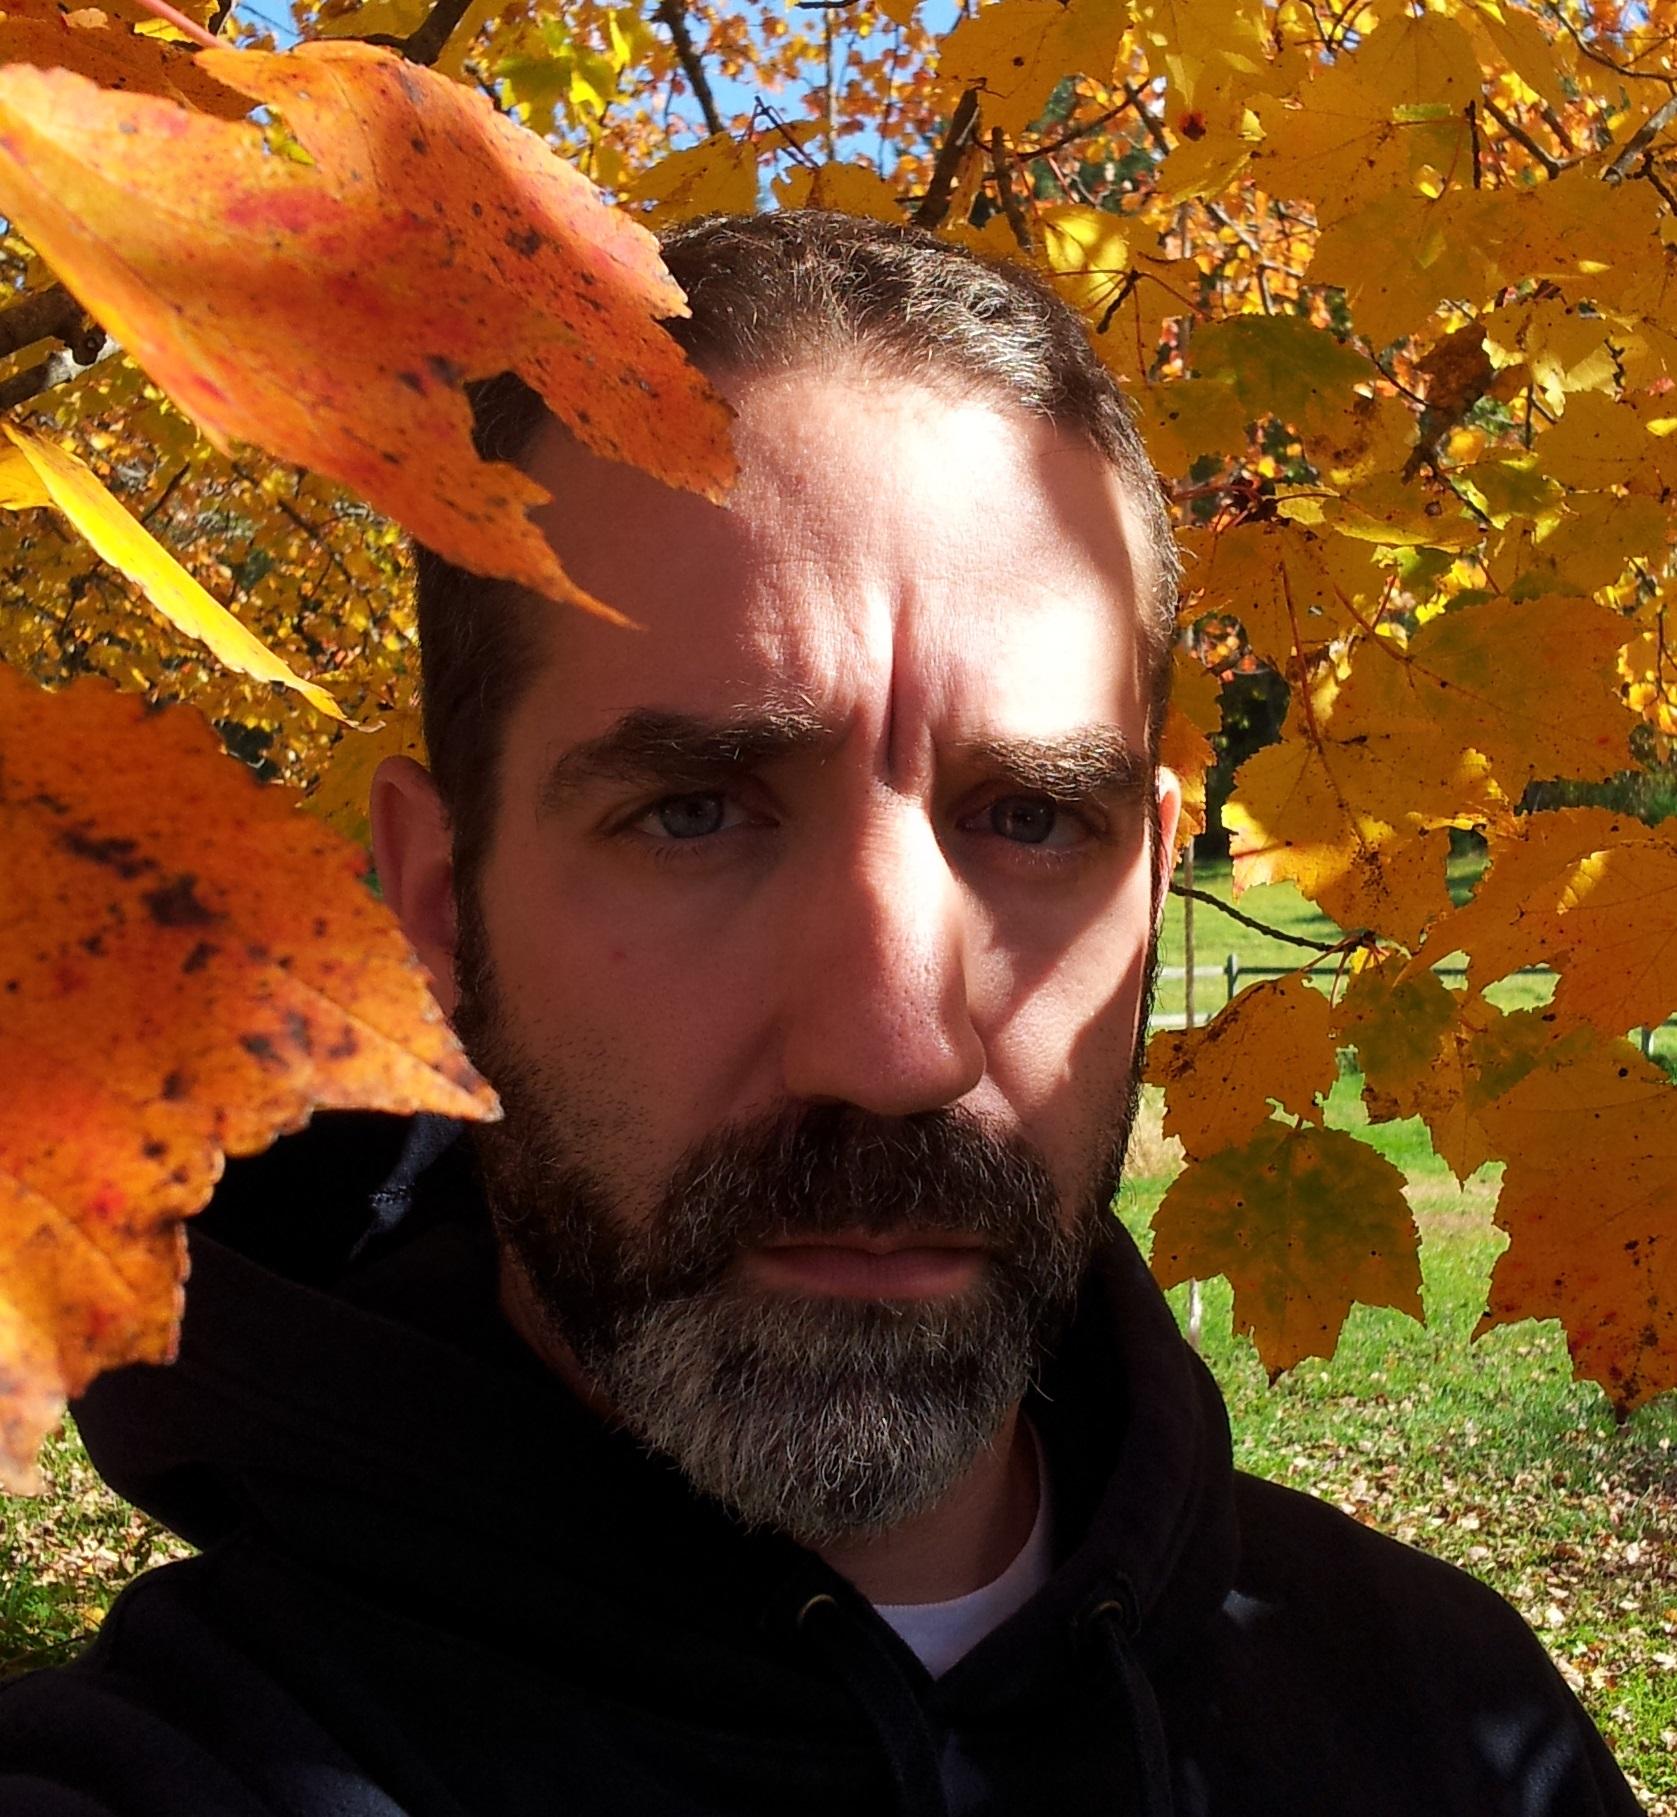 g Elmer Munson - Horror Authorg Elmer Munson - Horror Author